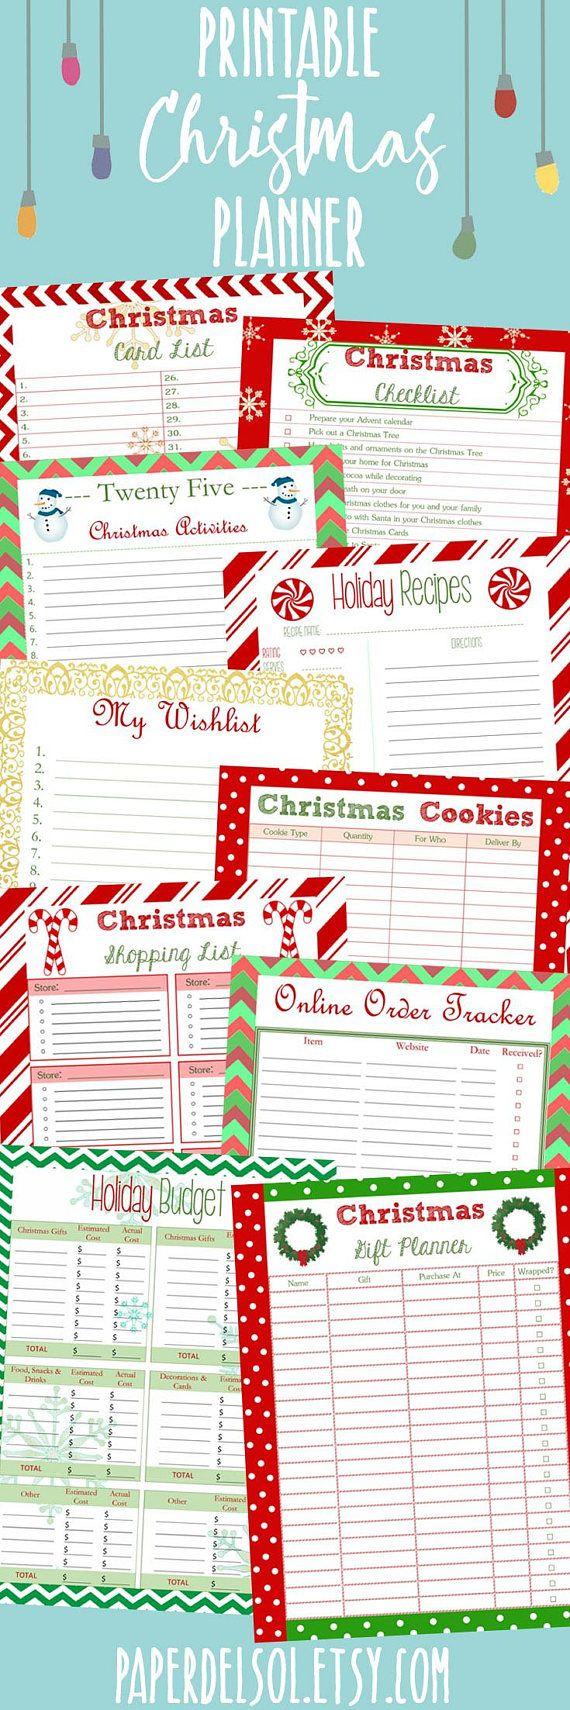 2017 Christmas Planner Printable, Instant Download Christmas ...